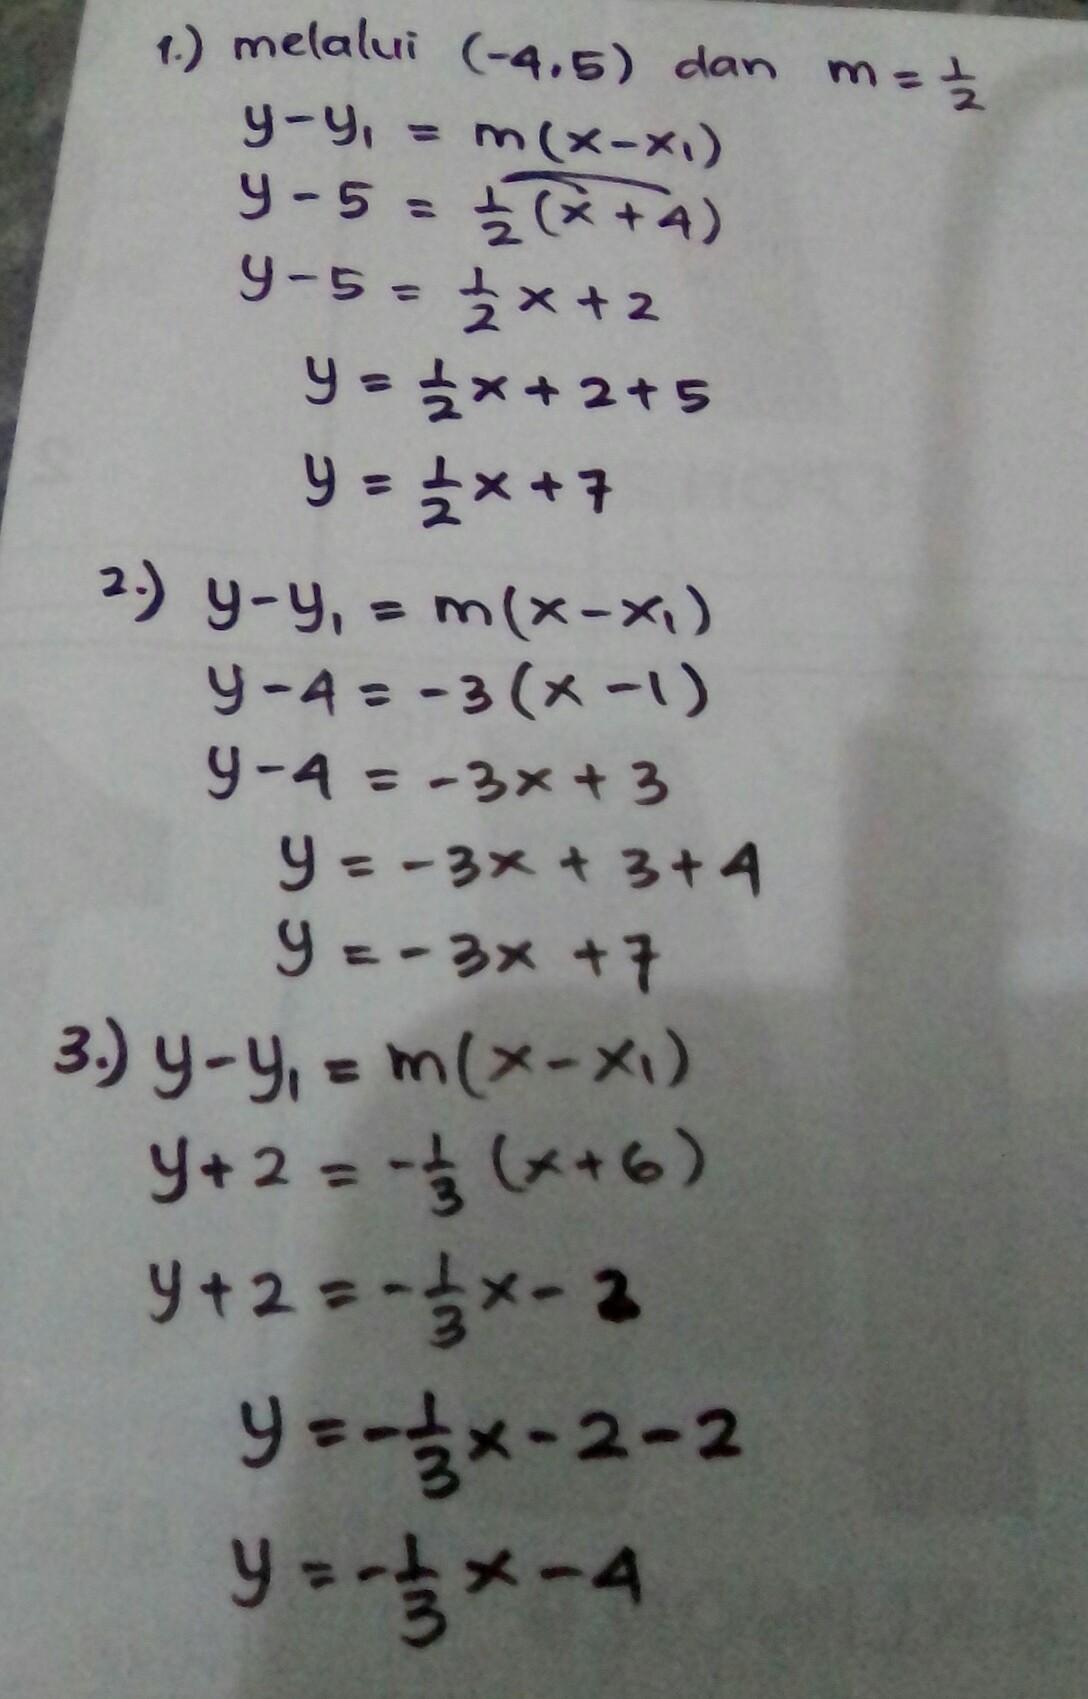 Contoh Soal Kumon Matematika Level A